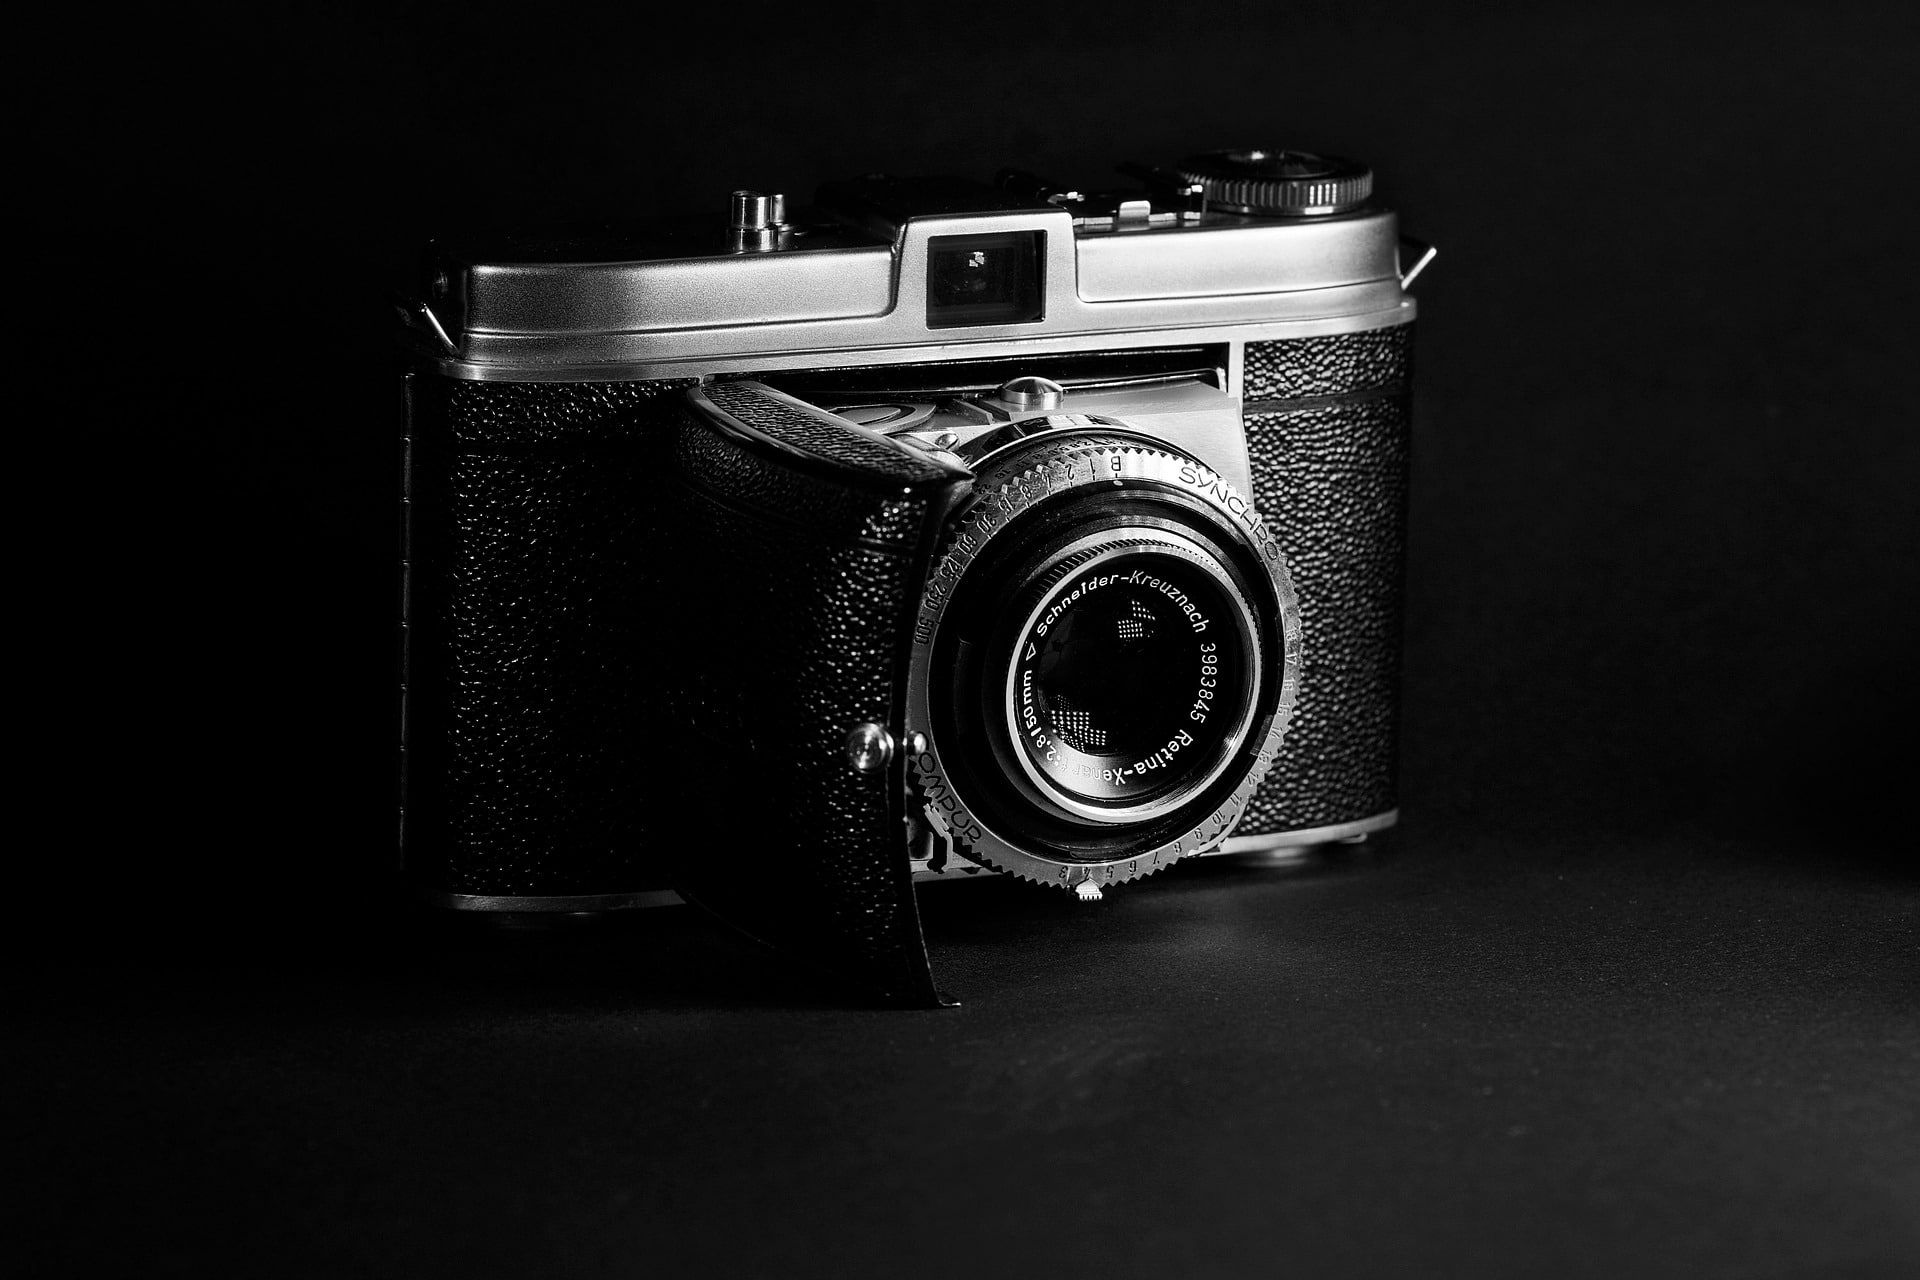 Kodak licencie 1000 employés supplémentaires (2)